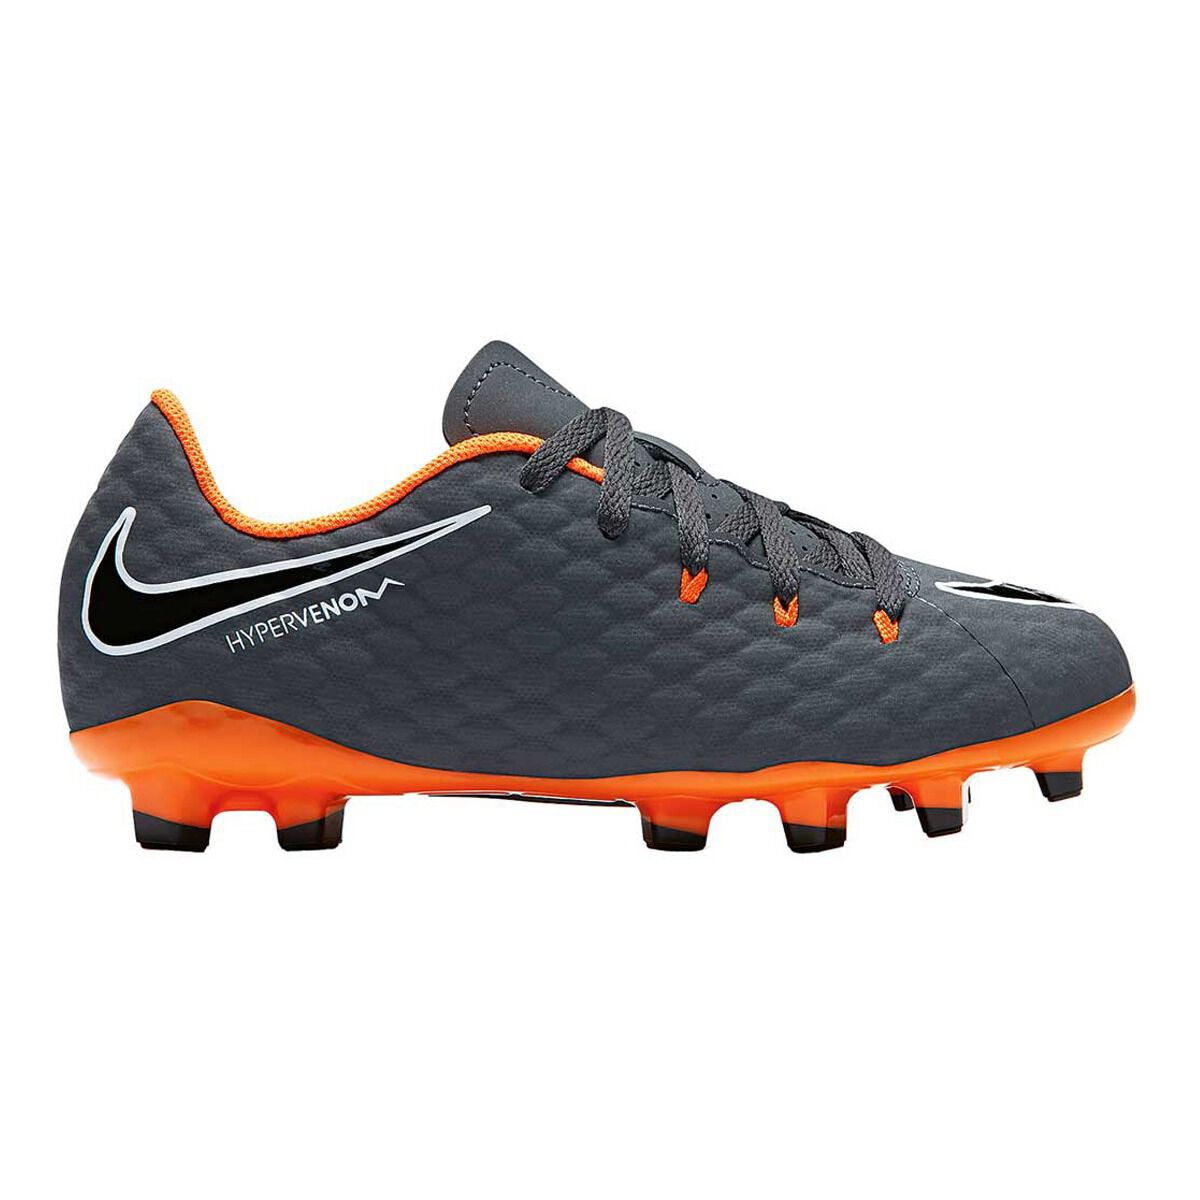 df68f84e1963 ... get nike hypervenom phantom iii academy junior football boots grey  orange us 2 junior grey 64172